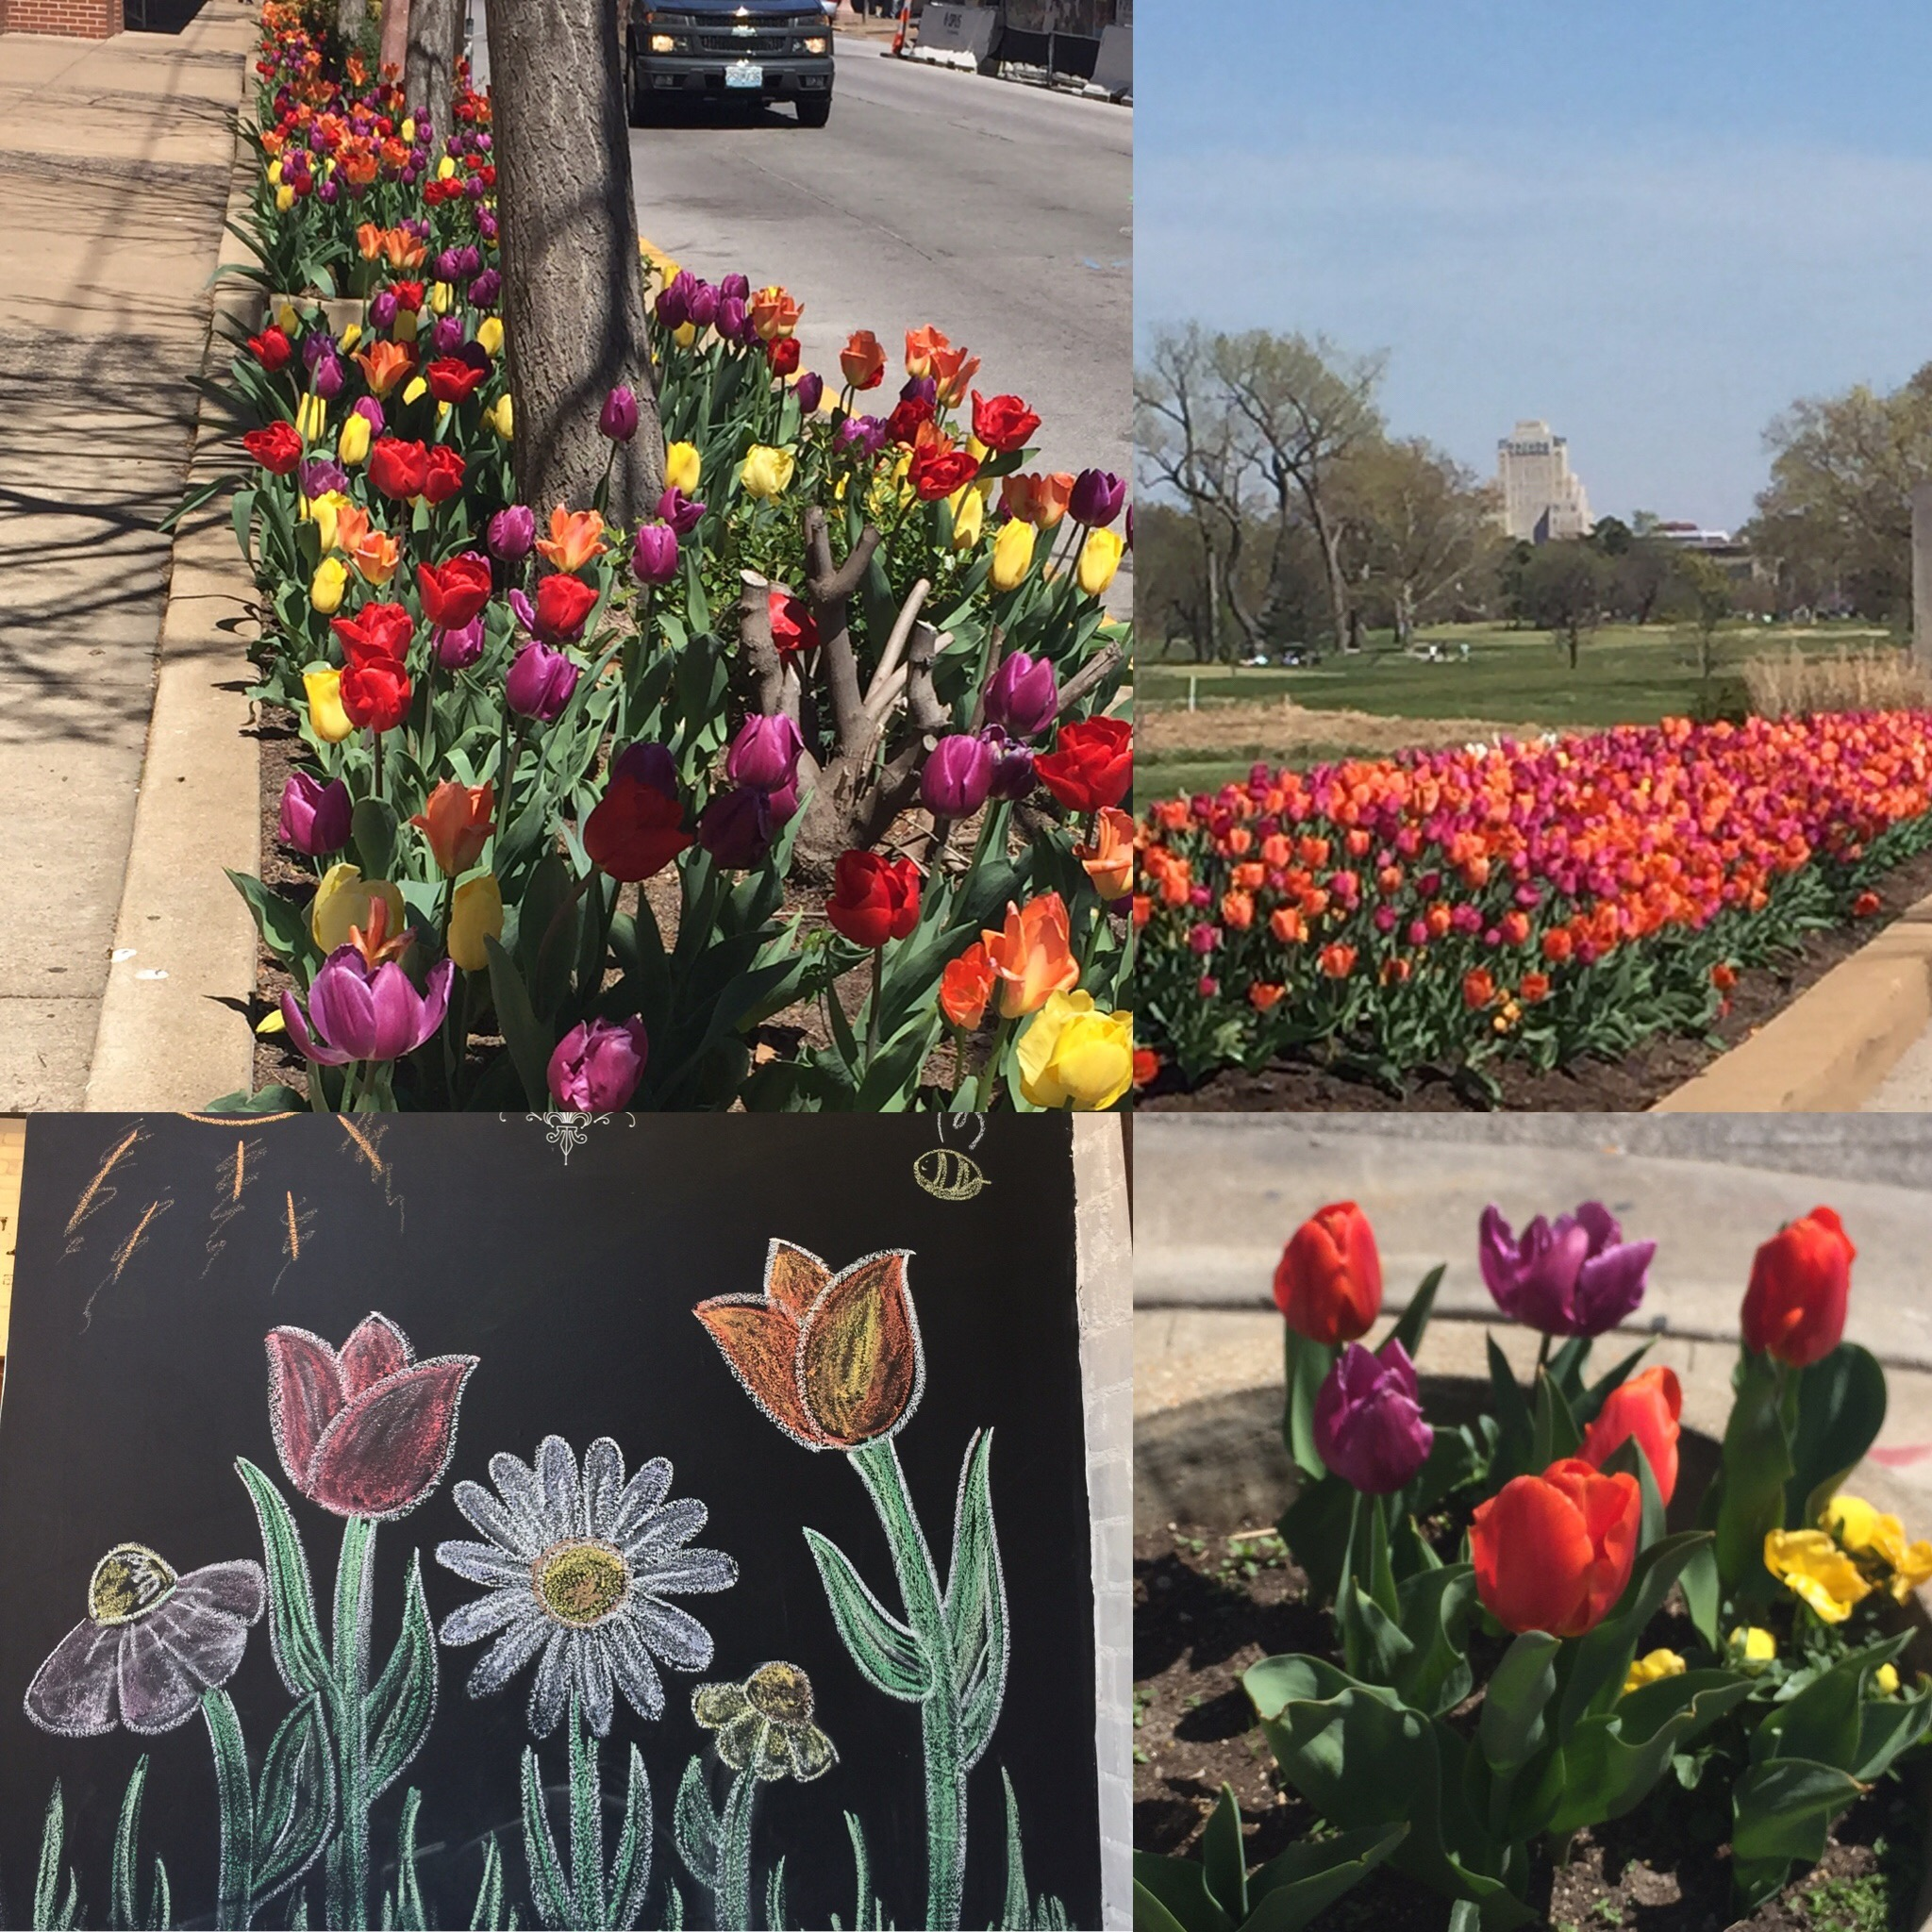 Tulips in St. Louis Weekend Foodie Getaway from Spinach Tiger